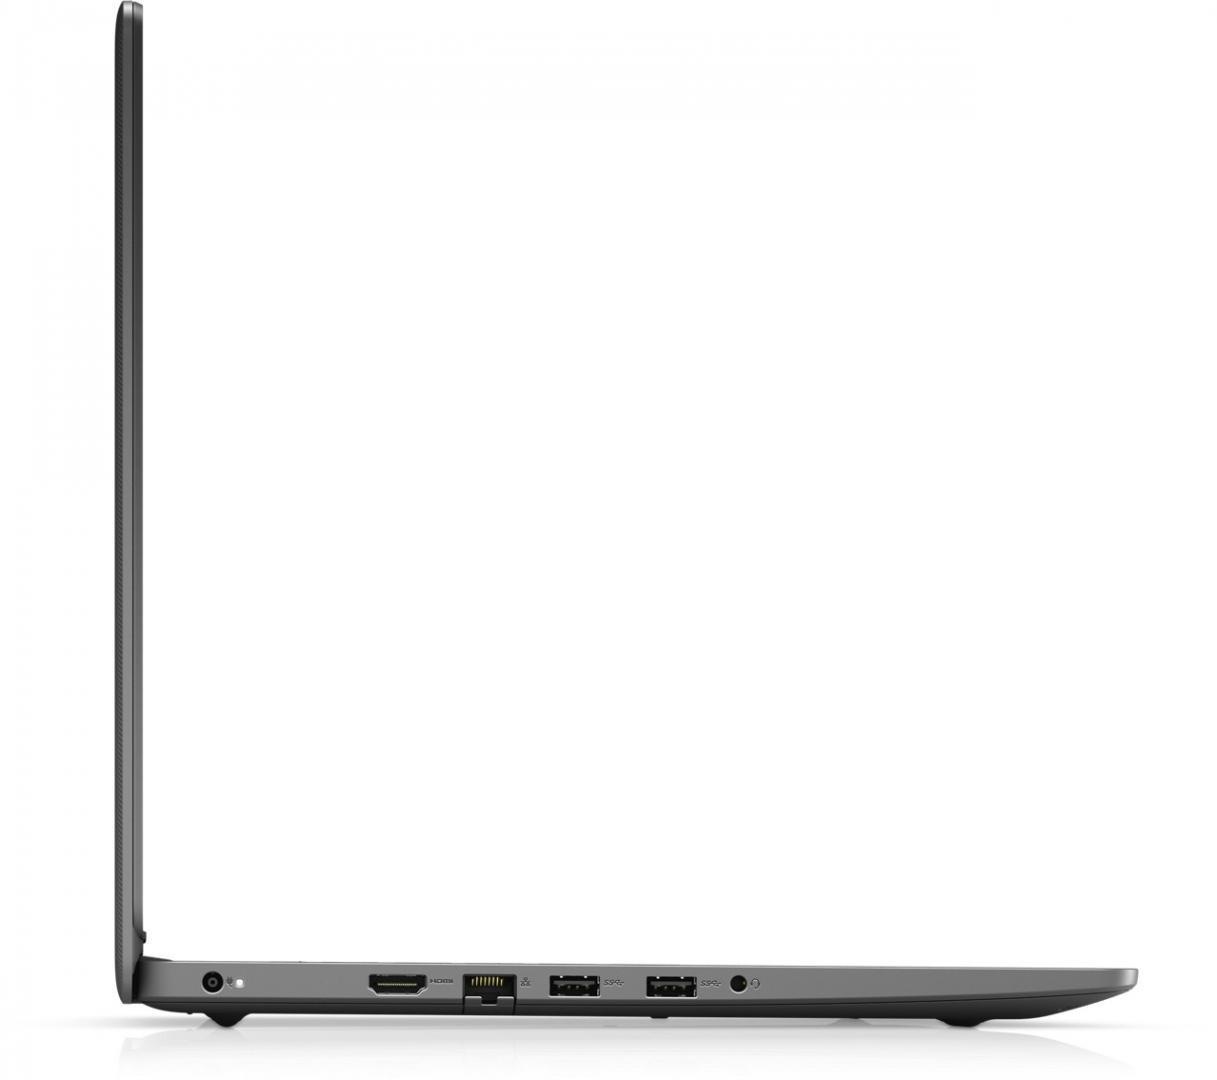 "Laptop Dell Vostro 3500, 15.6"" FHD, i3-1115G4, 8GB, 256GB SSD, Intel UHD Graphics, Ubuntu - imaginea 4"